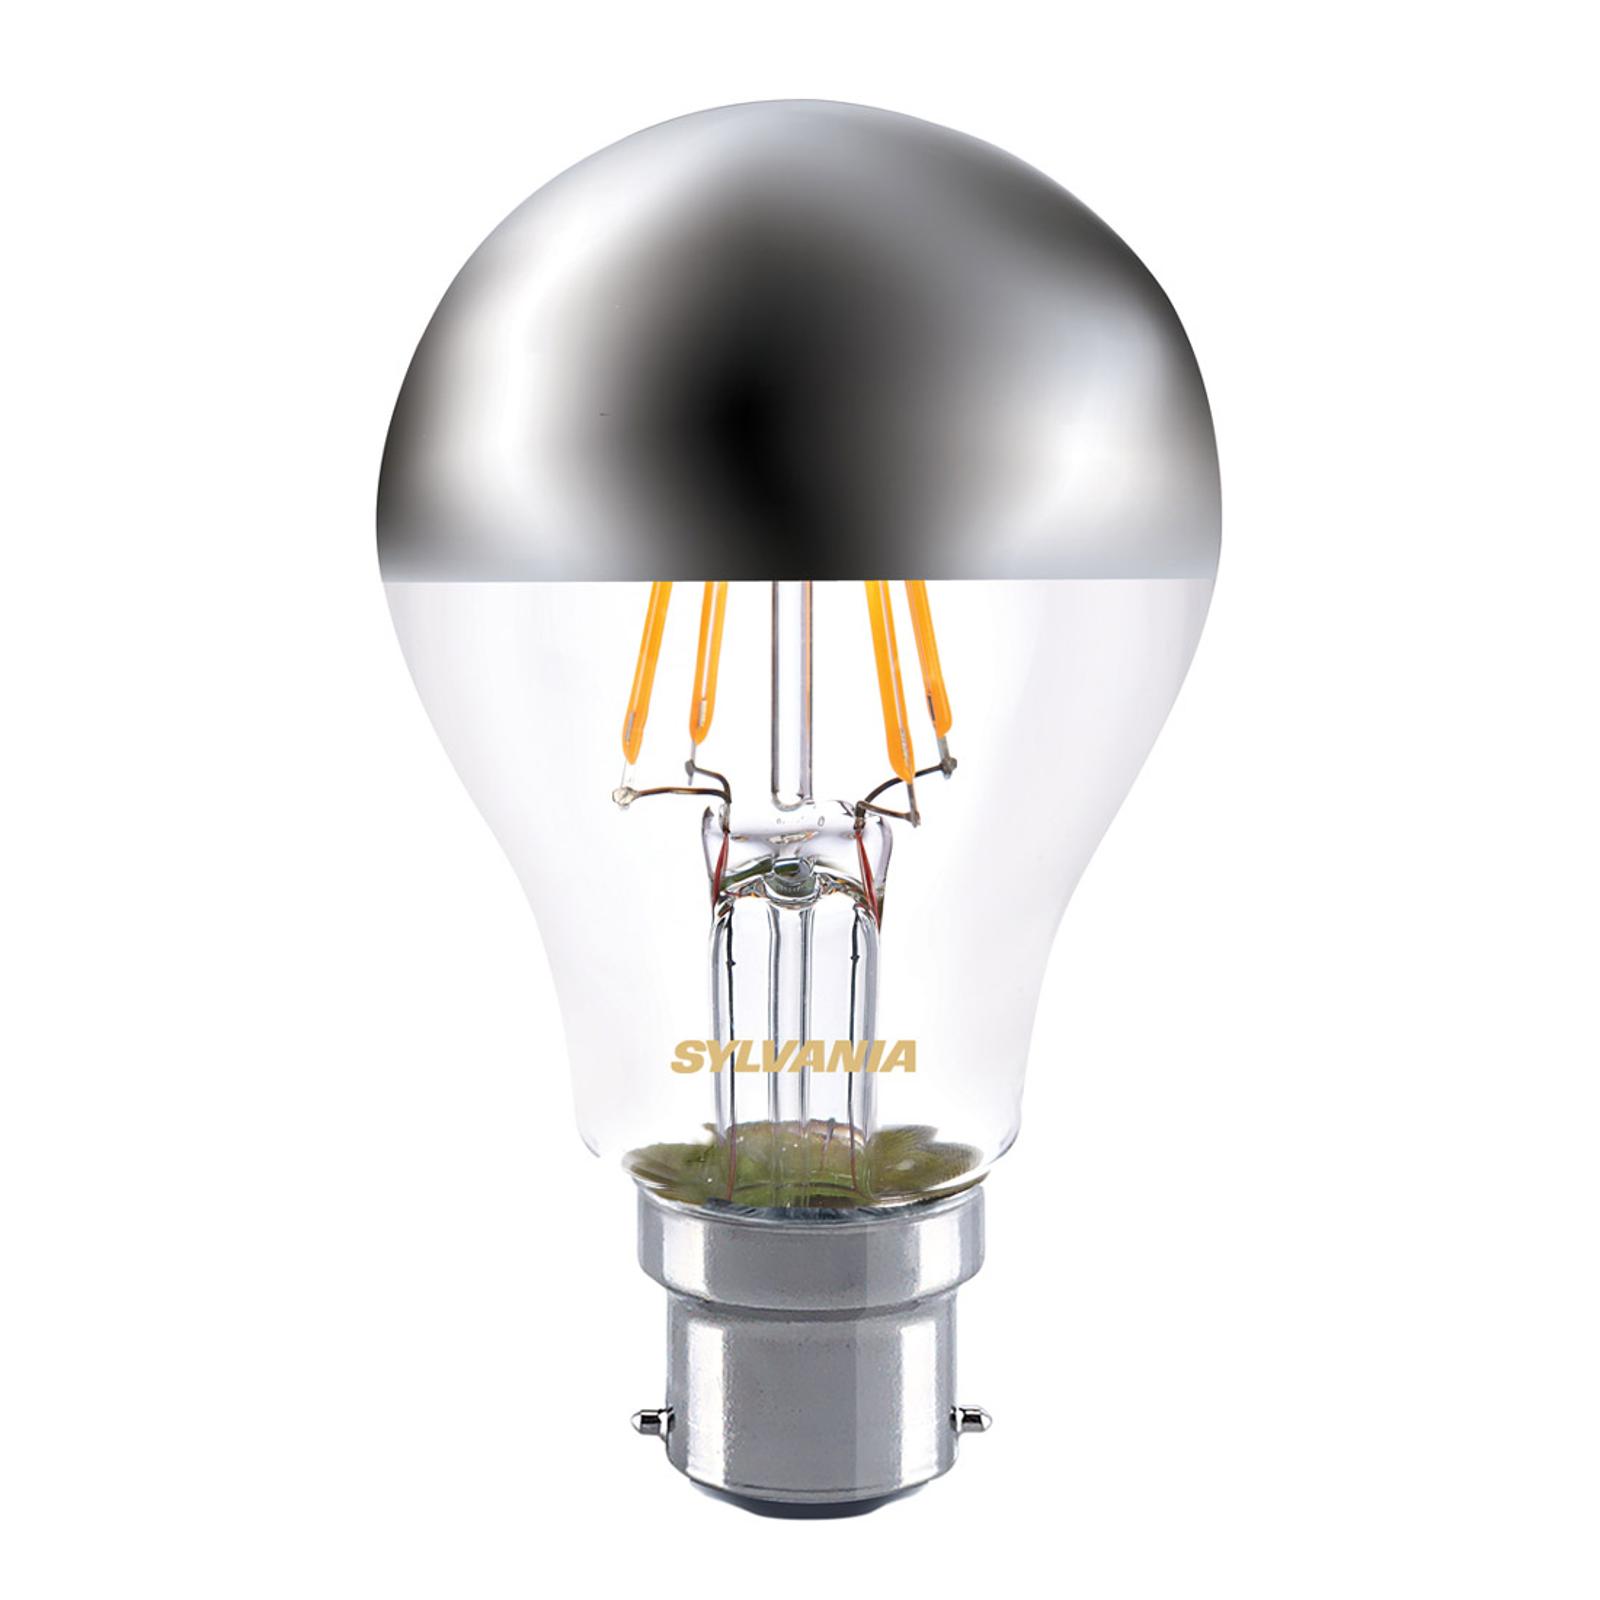 B22 4W 827 LED toppforspeilet lyspære